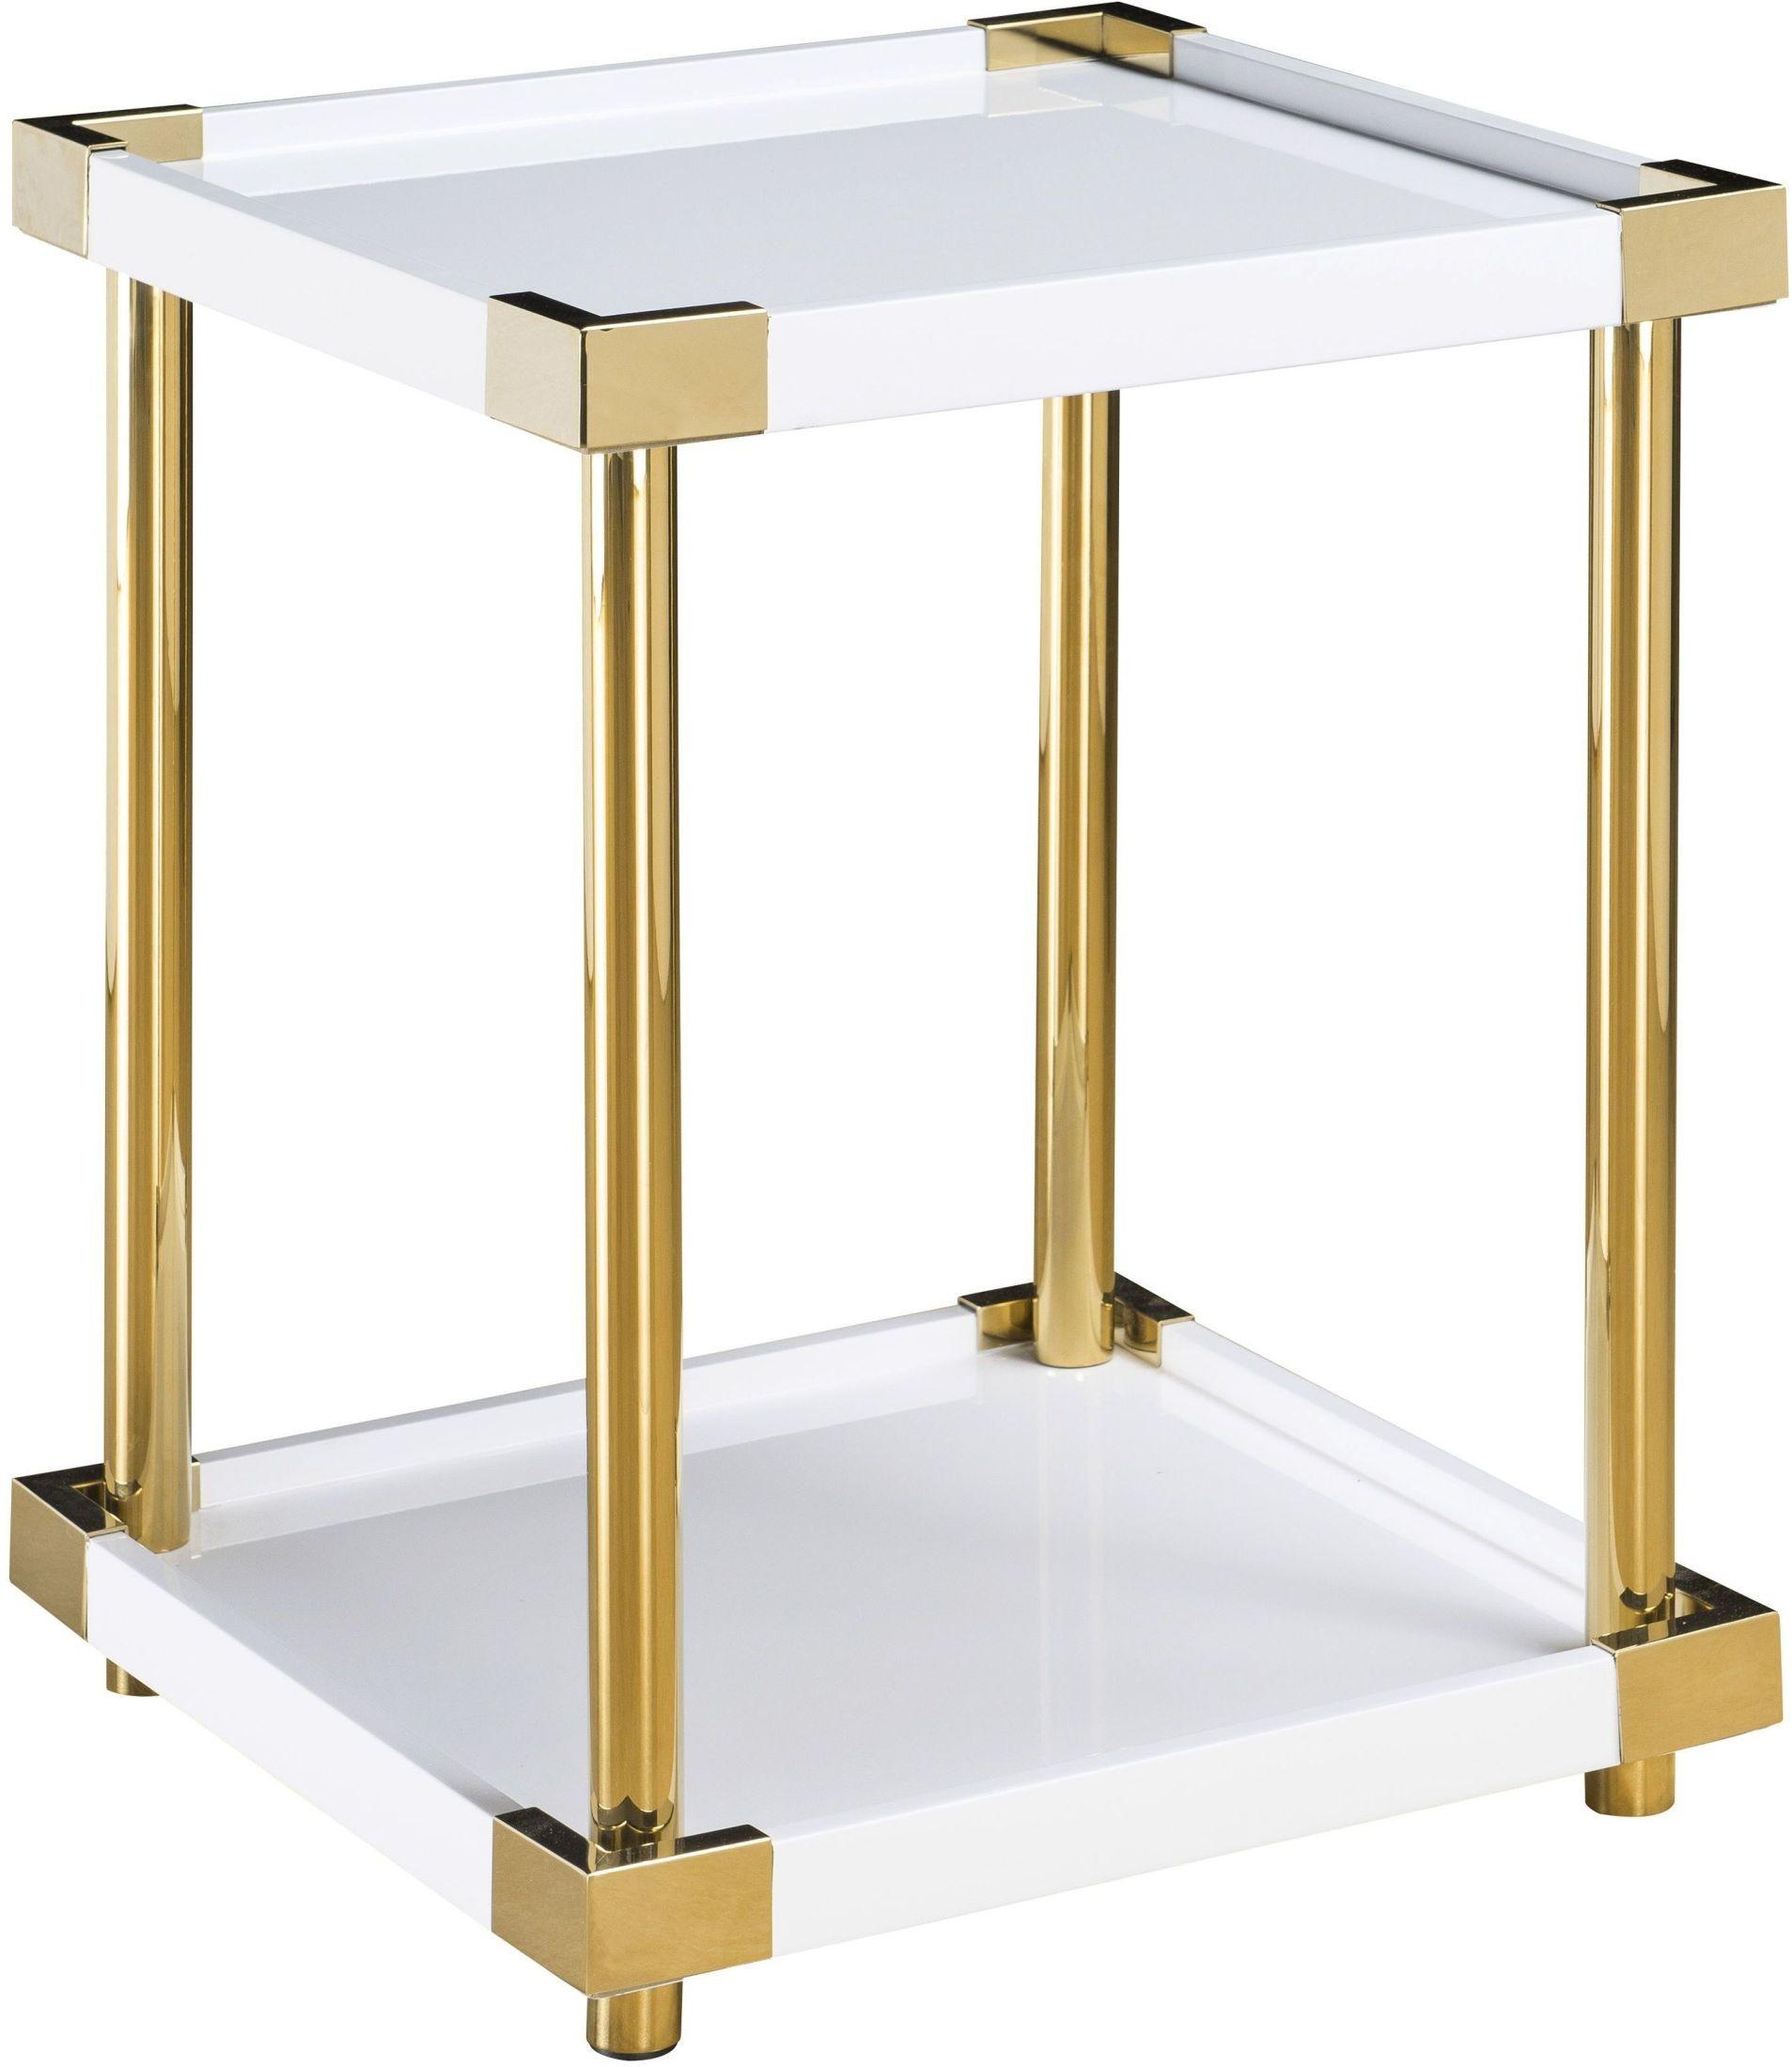 ariene modern gold white accent table from pulaski coleman furniture. Black Bedroom Furniture Sets. Home Design Ideas